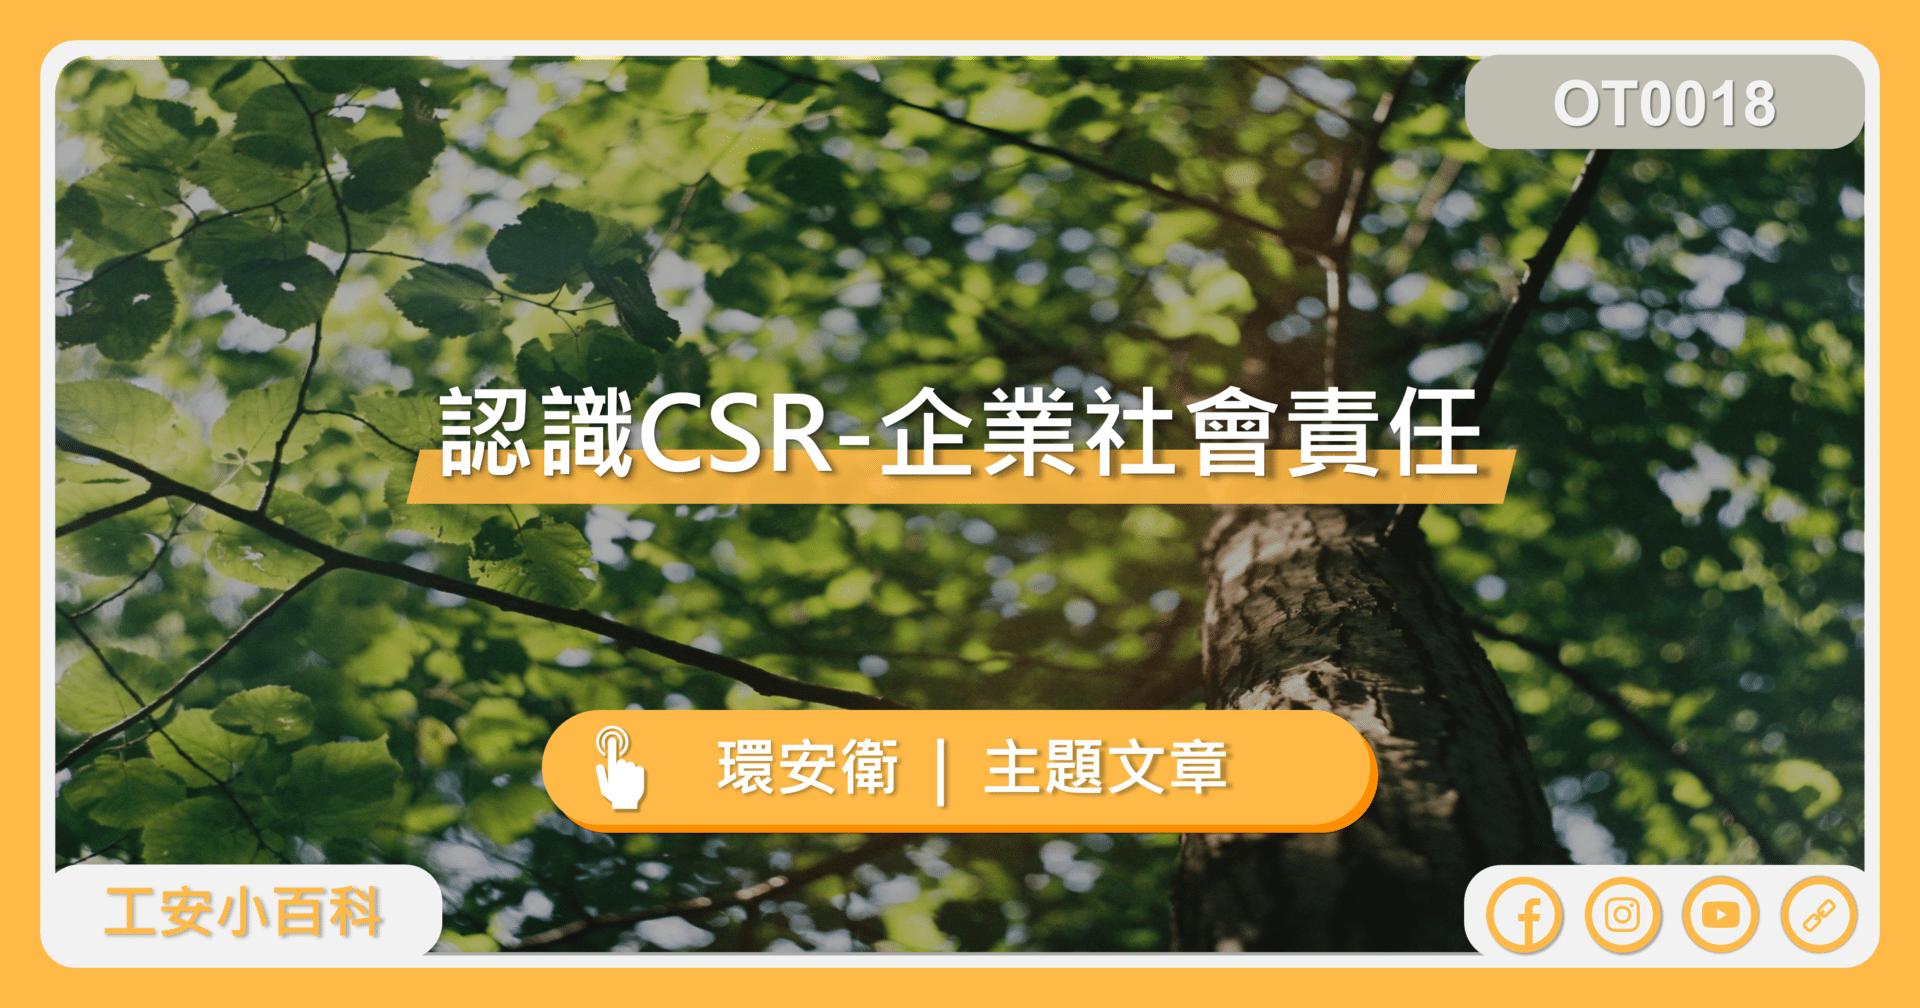 CSR-企業社會責任